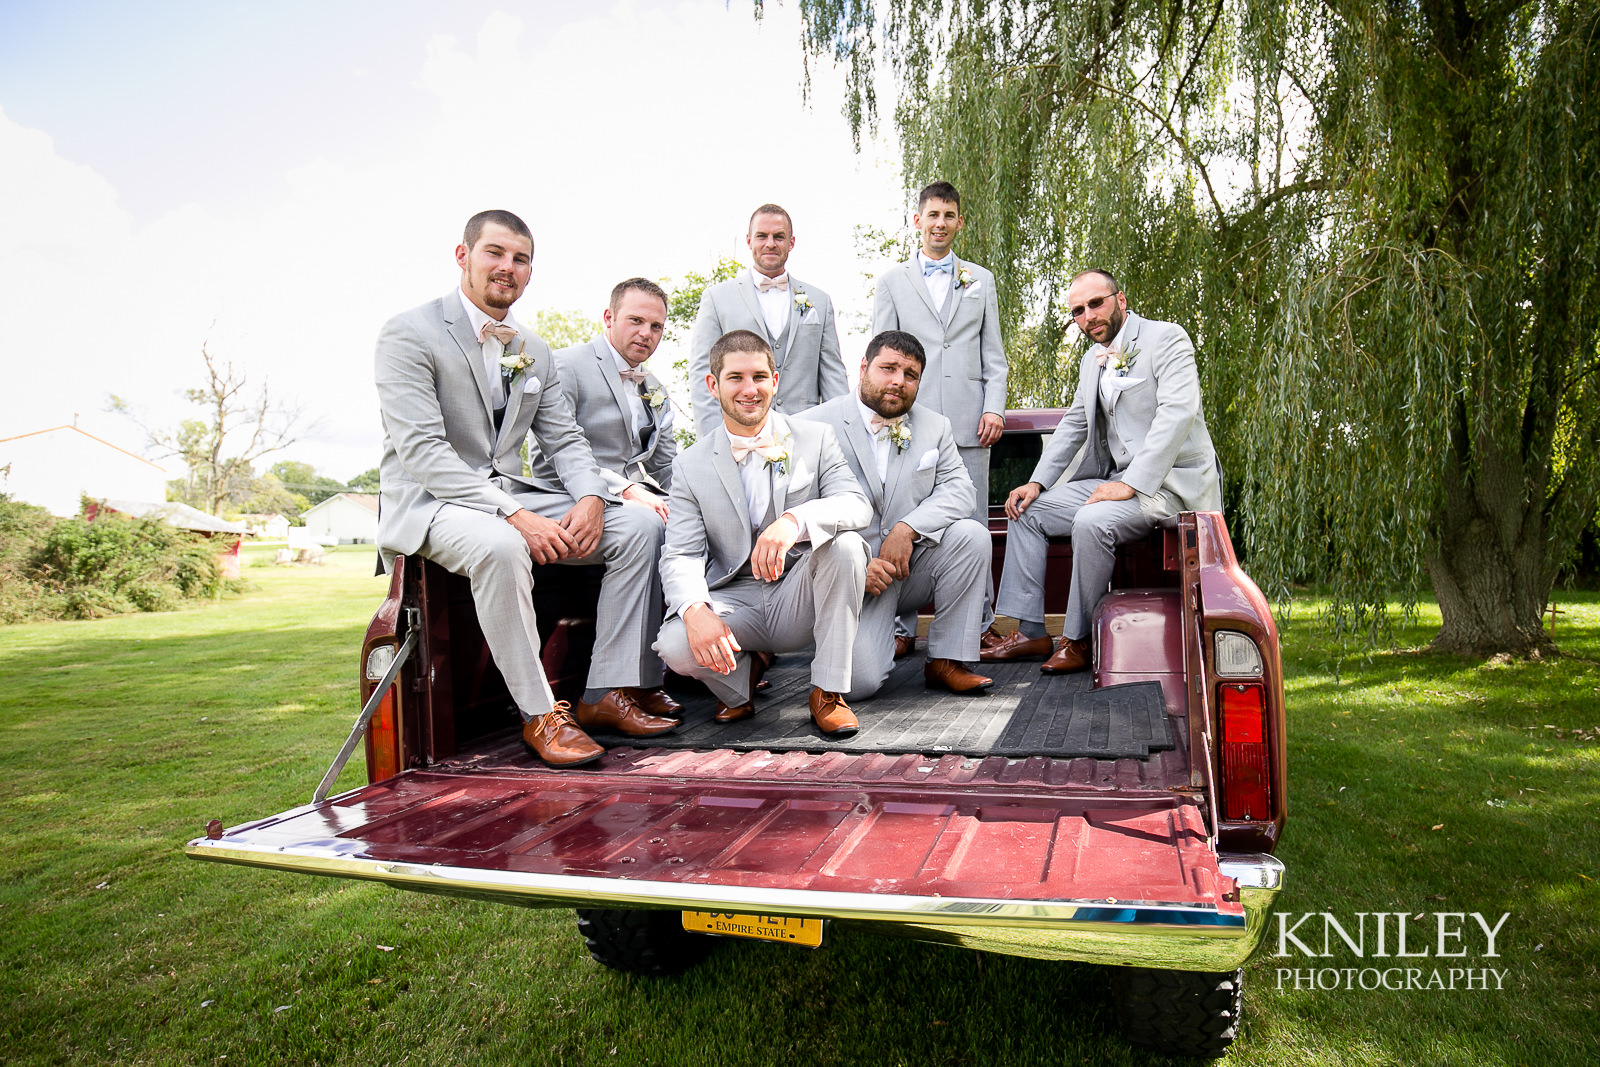 042 - Buffalo NY wedding - Preparation pictures - IMG_7593.jpg